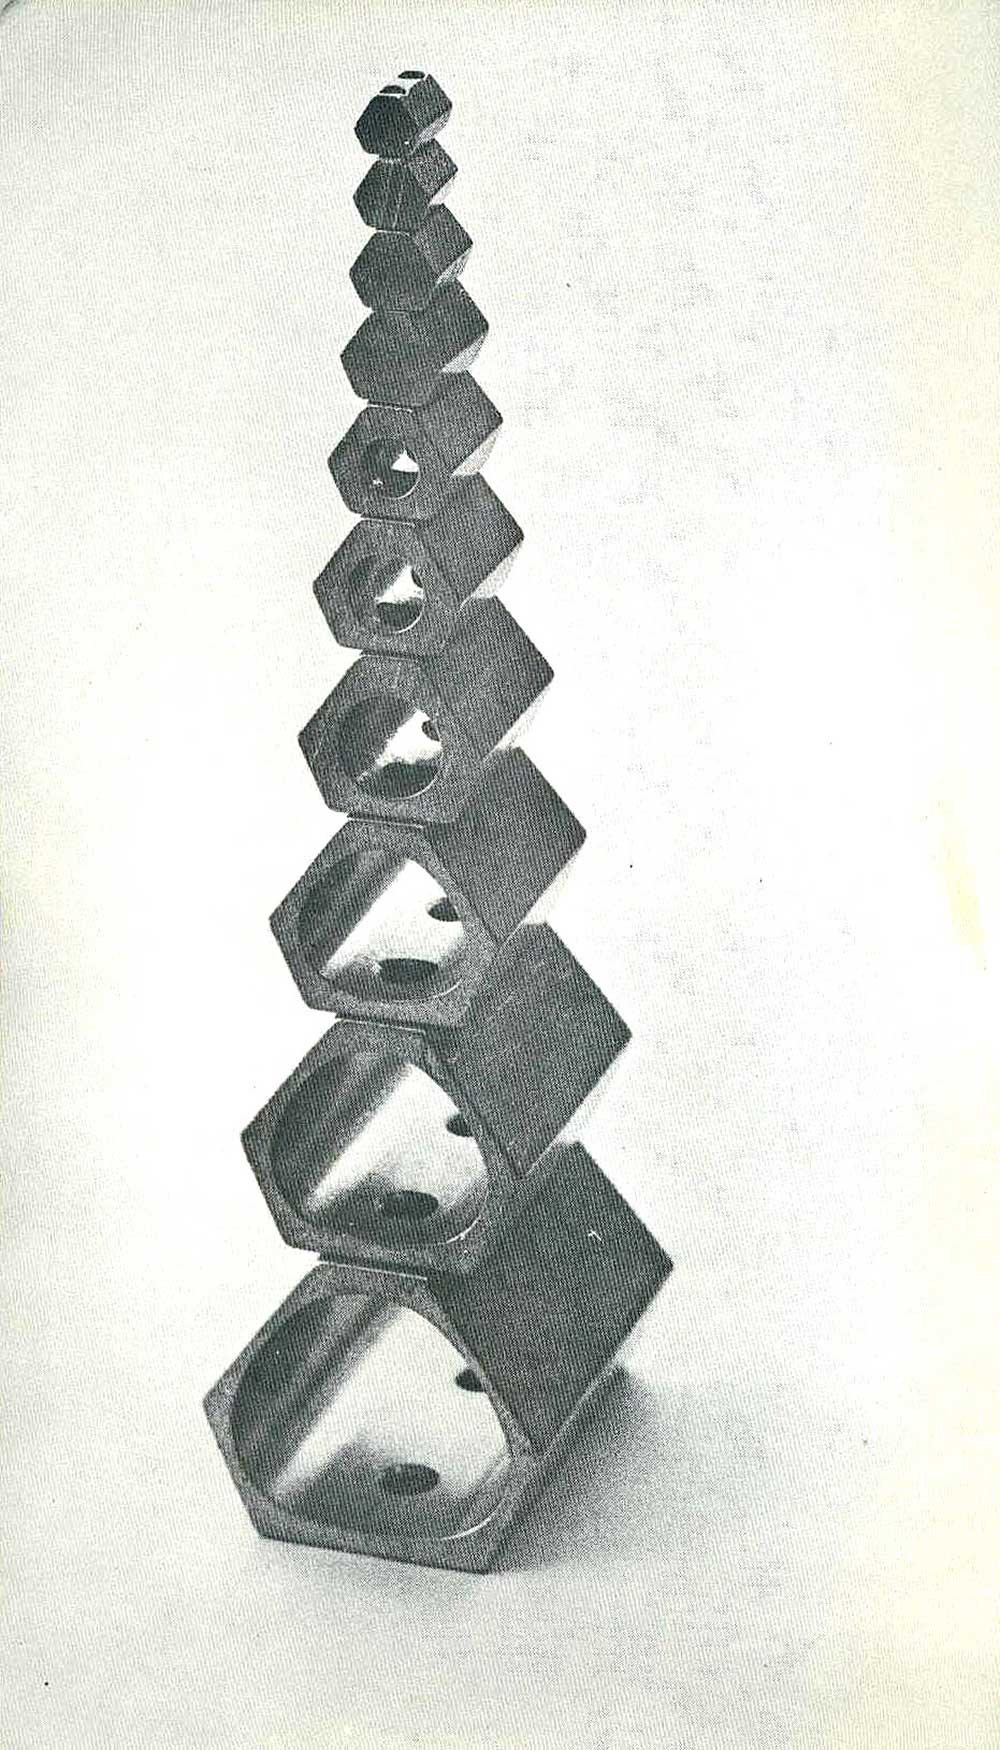 Repro z katalogu Chouinard z roku 1971